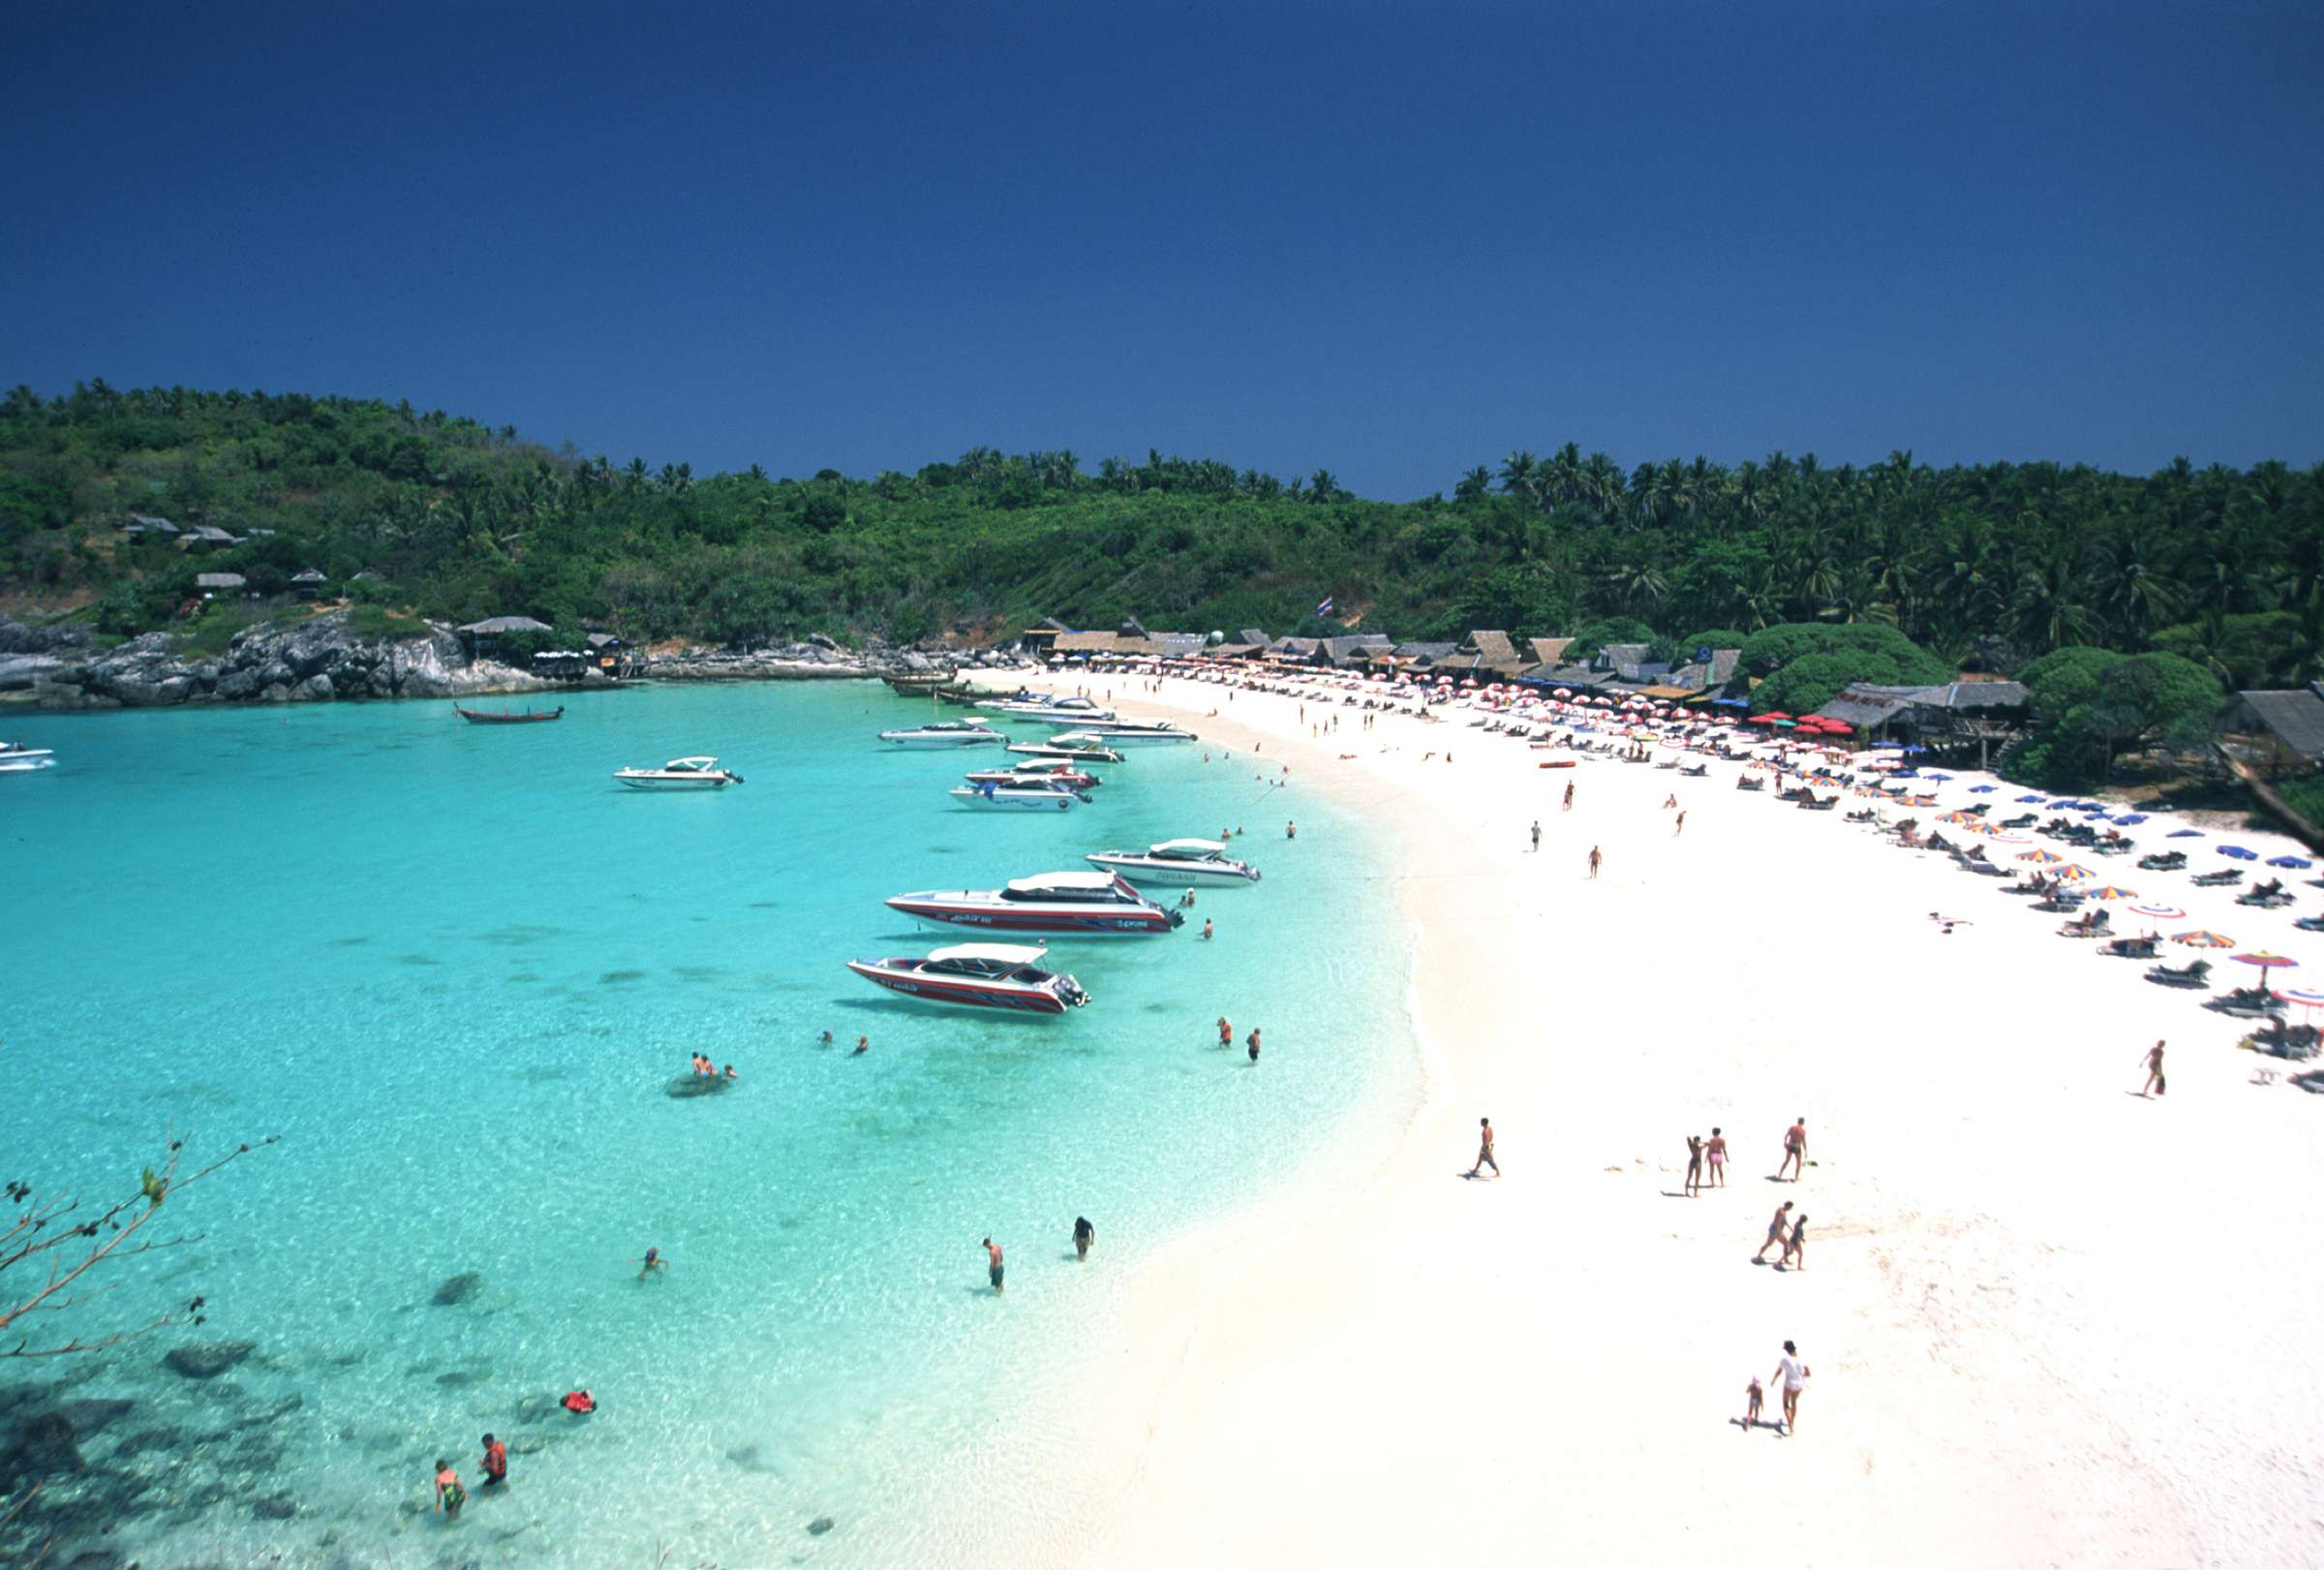 Especial turismo en Tailandia: Phuket